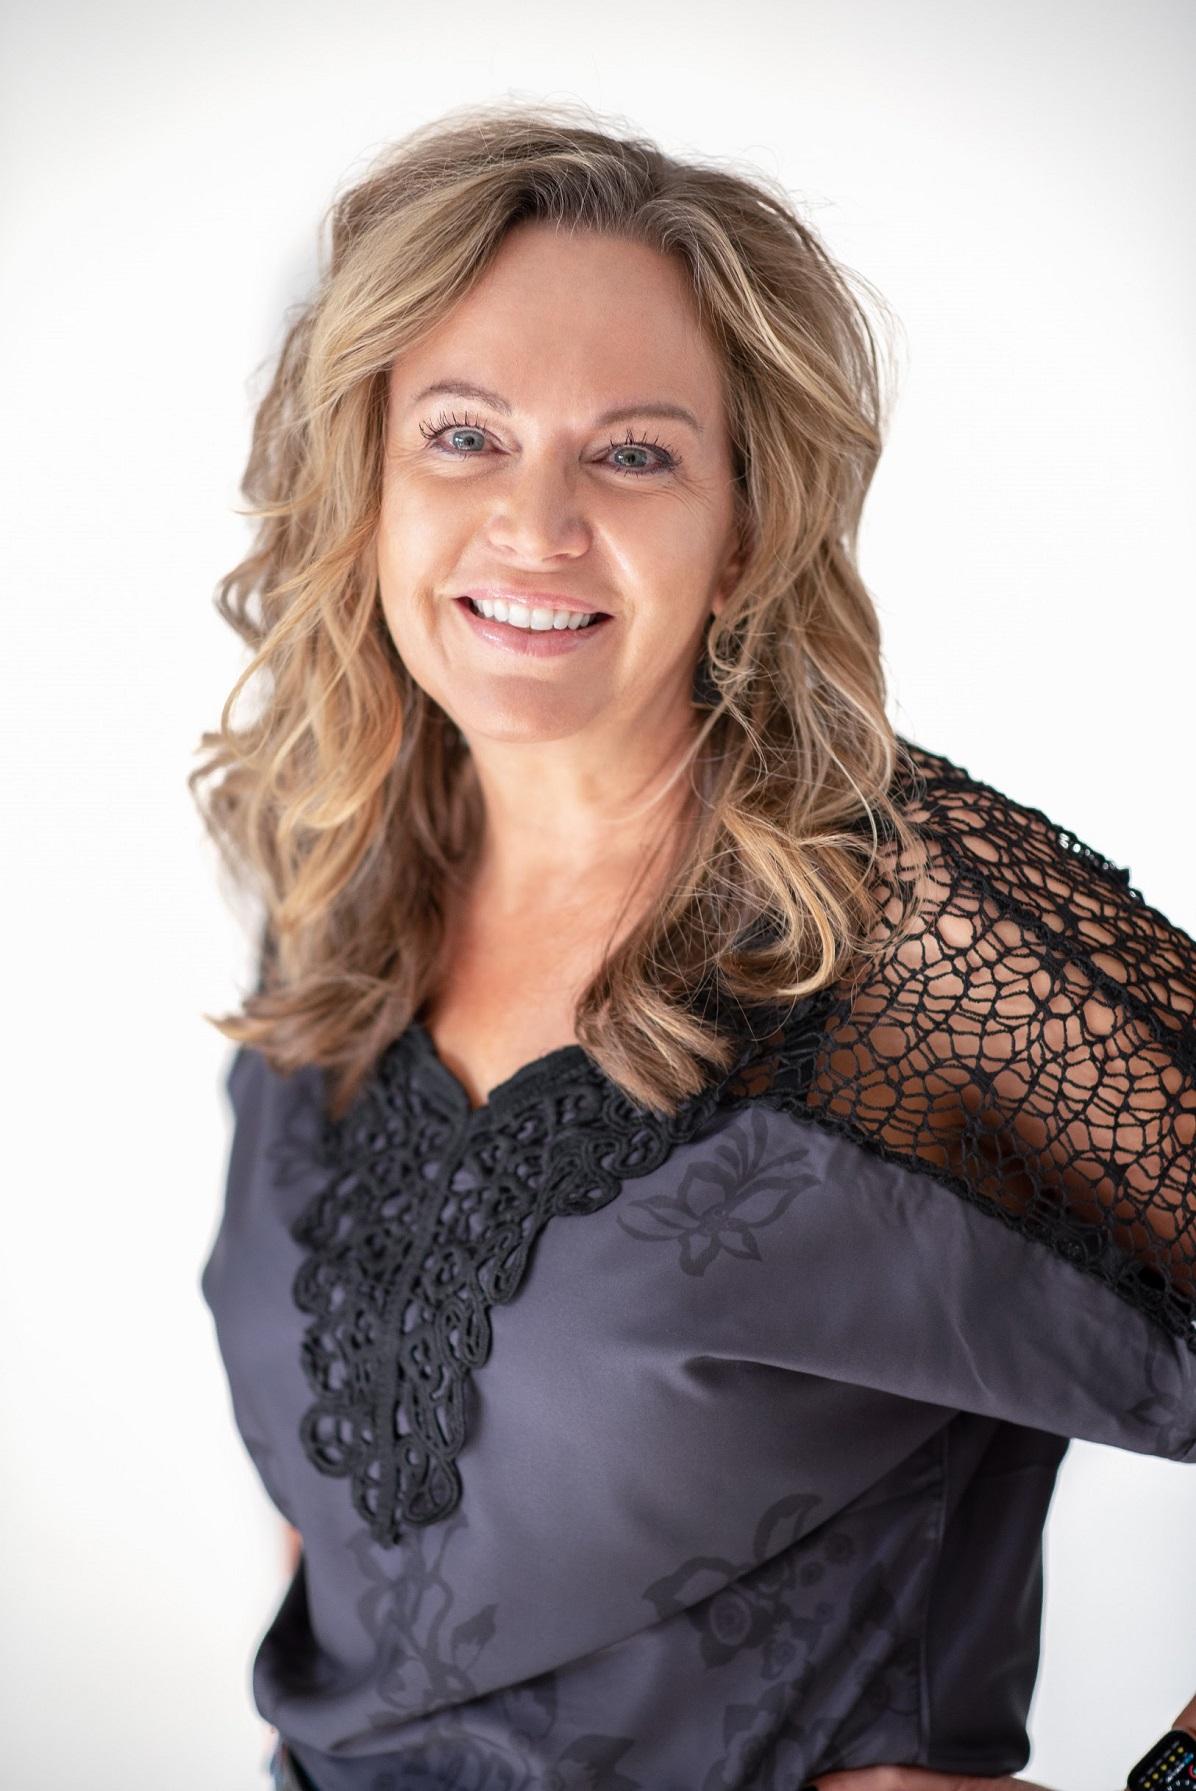 Rhonda K. Bowen, DDS